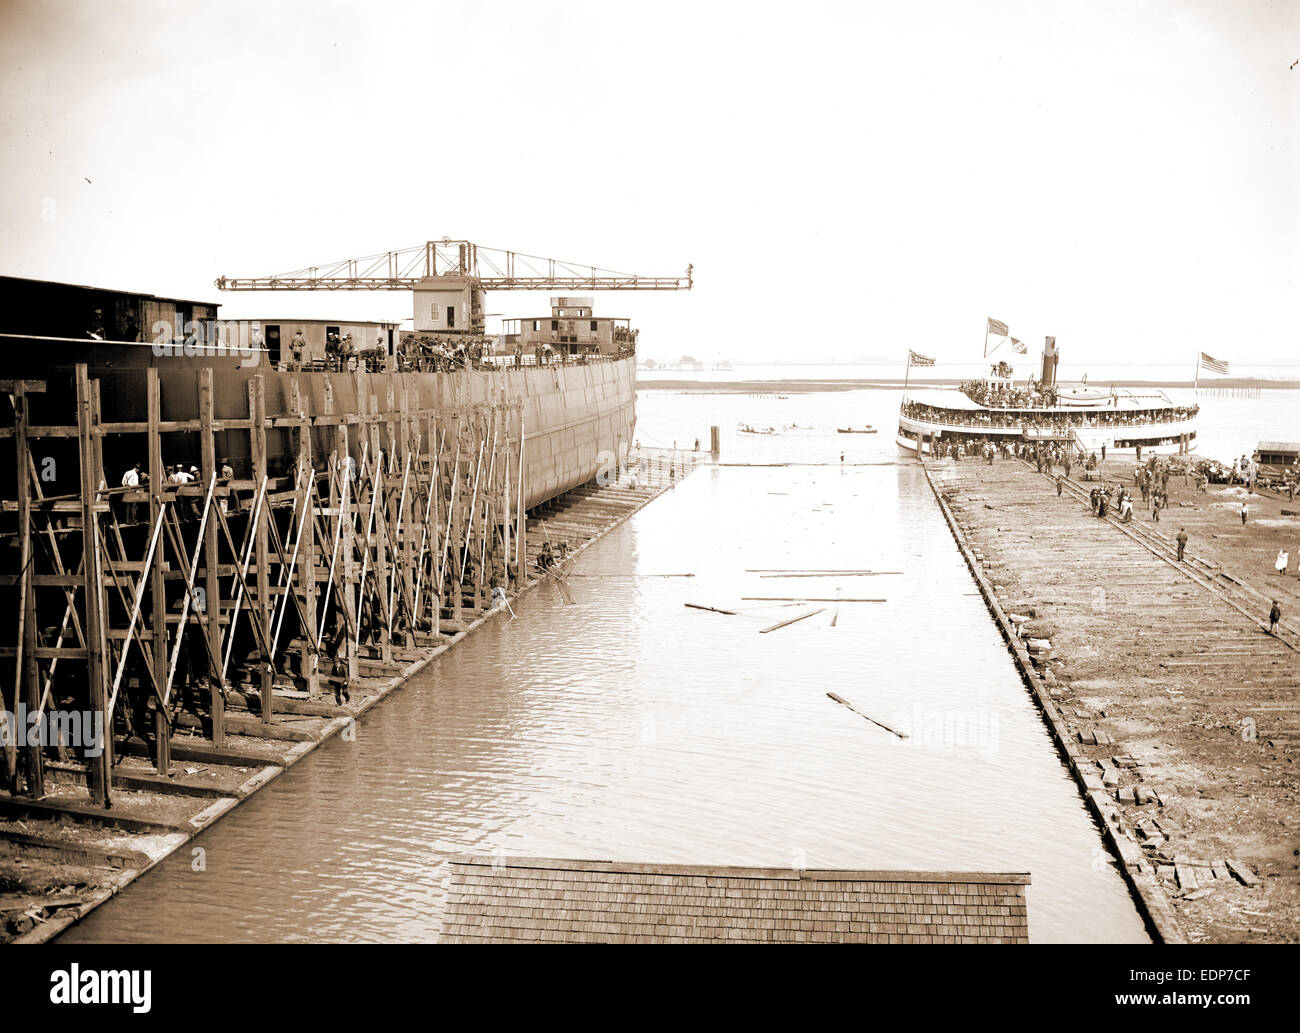 Str. Simon J. Murphy on the ways, Simon J. Murphy (Steamship), Ships, Boat & ship industry, Piers & wharves, - Stock Image